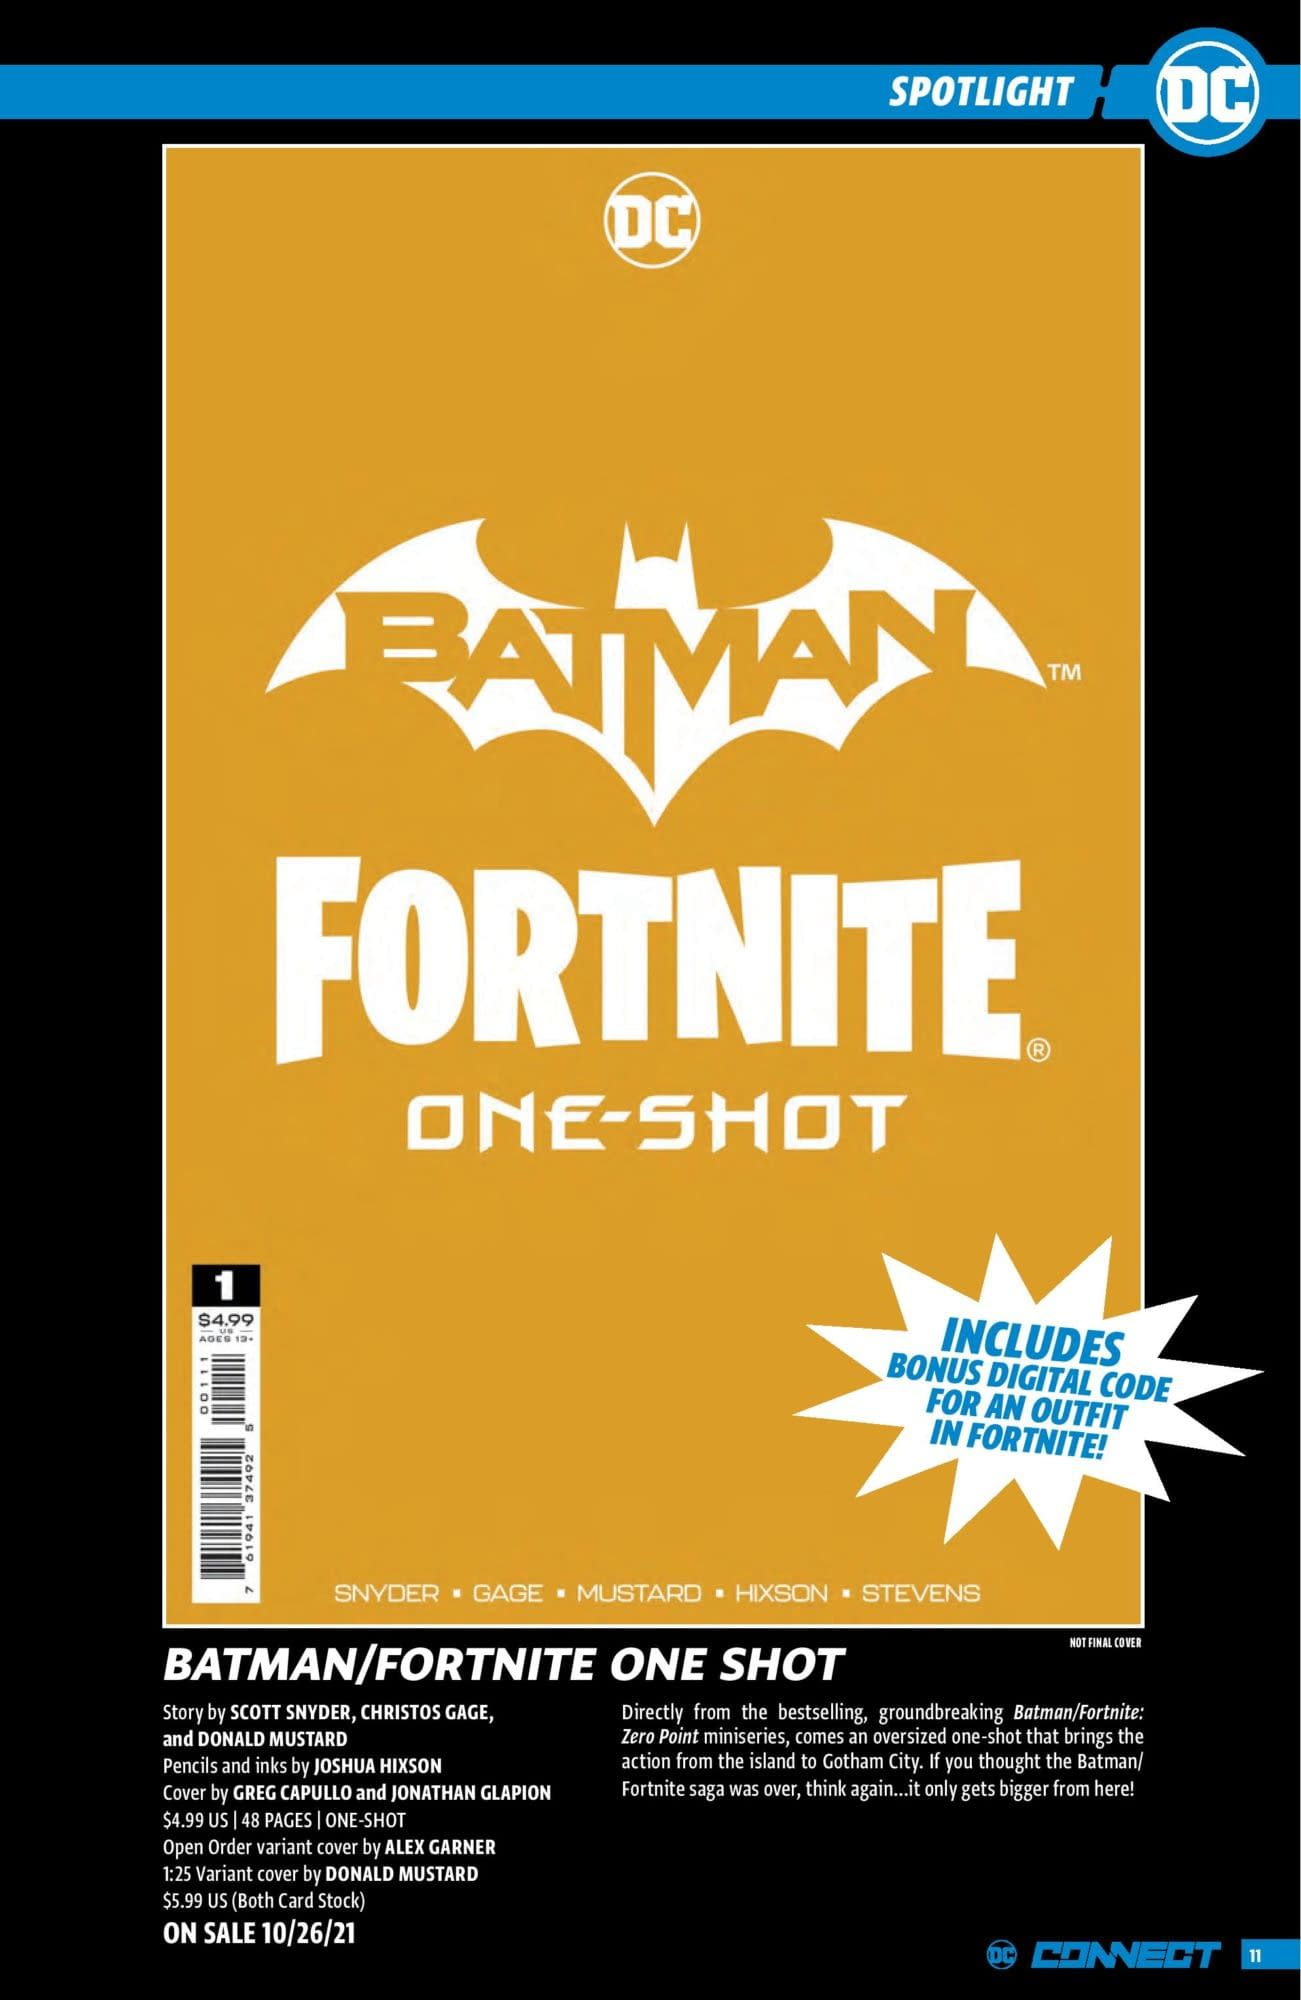 DC Connect, Batman/Fortnite teaser